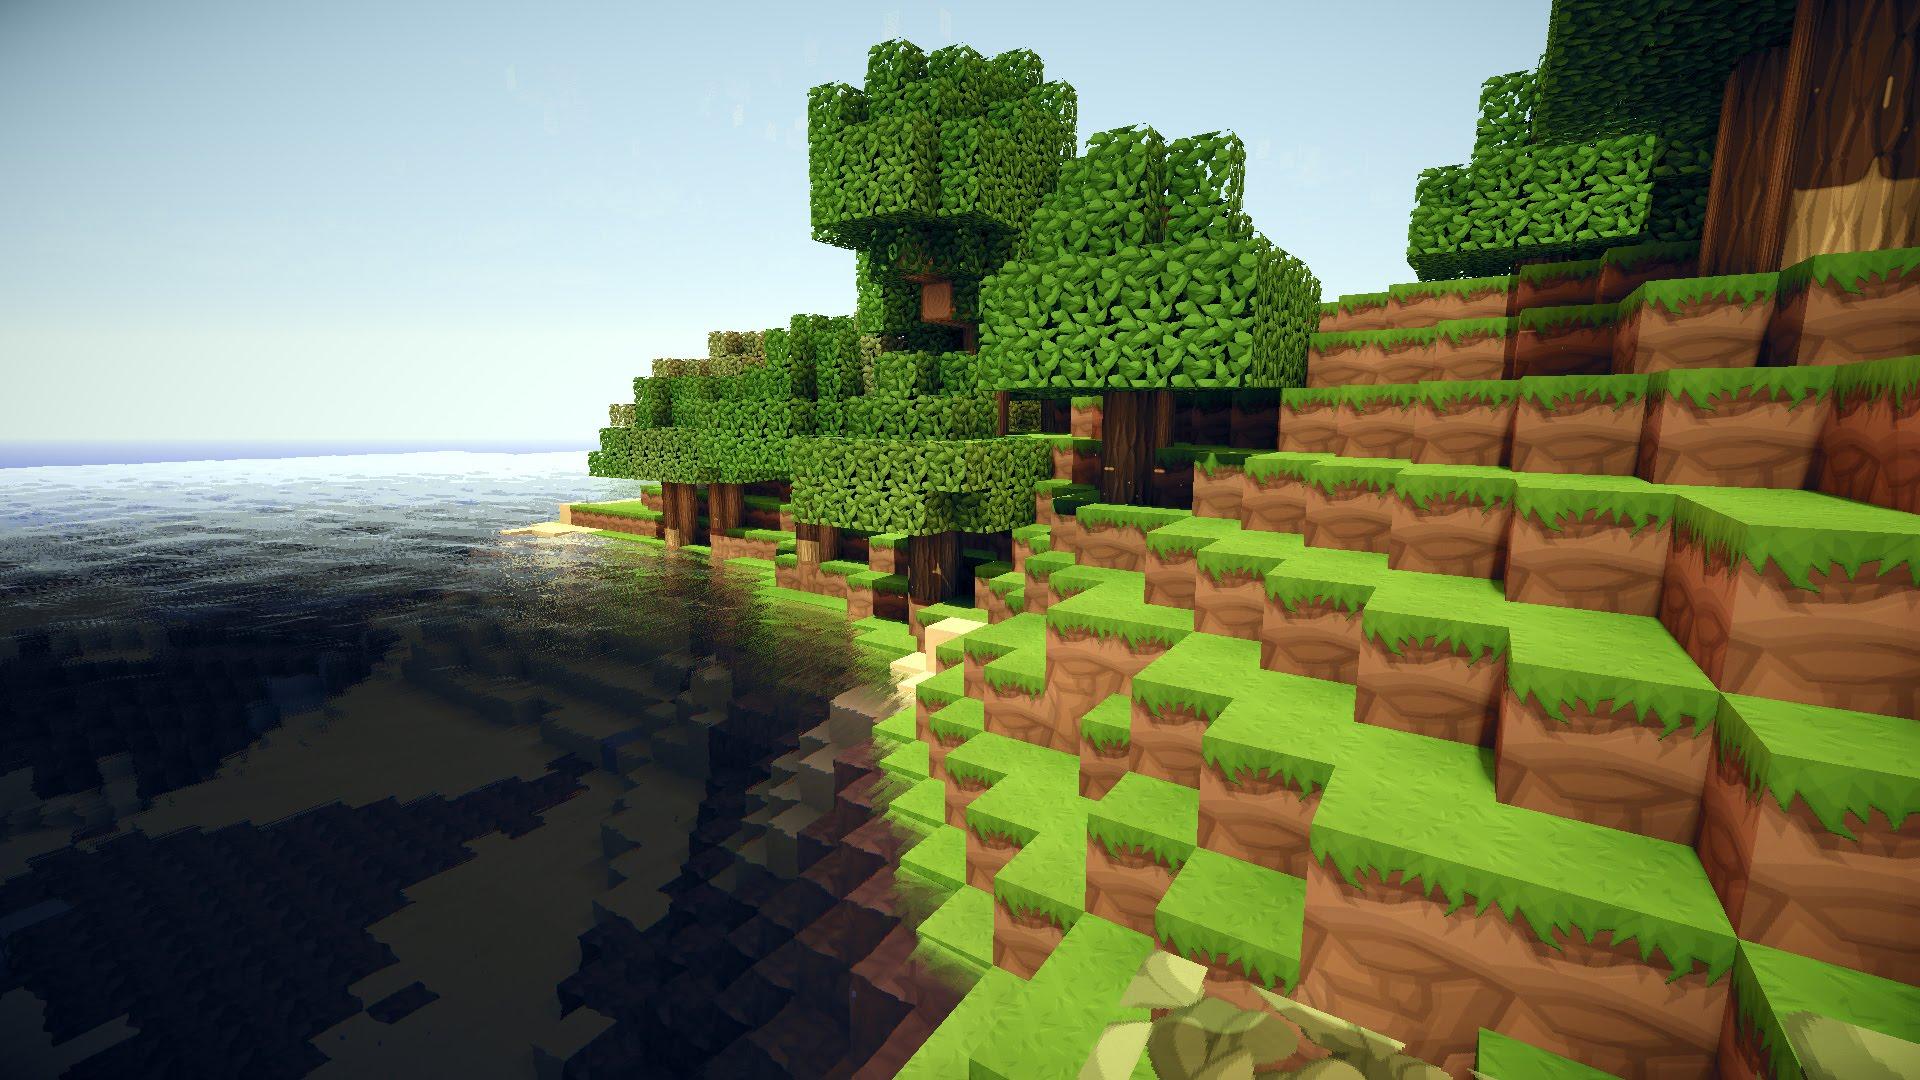 Free download Best Background Music For Minecraft Videos 2